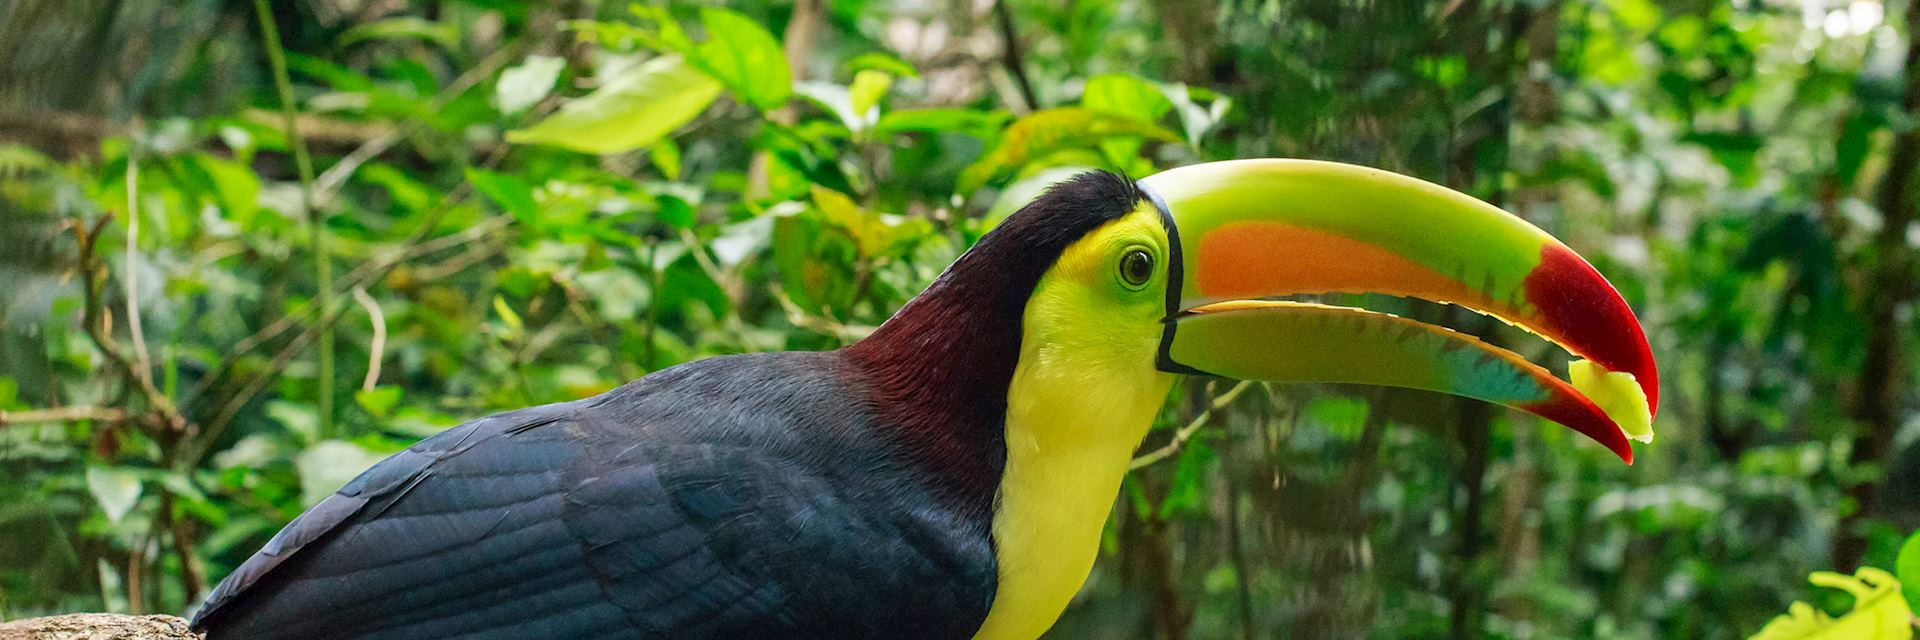 Toucan in Belize jungle